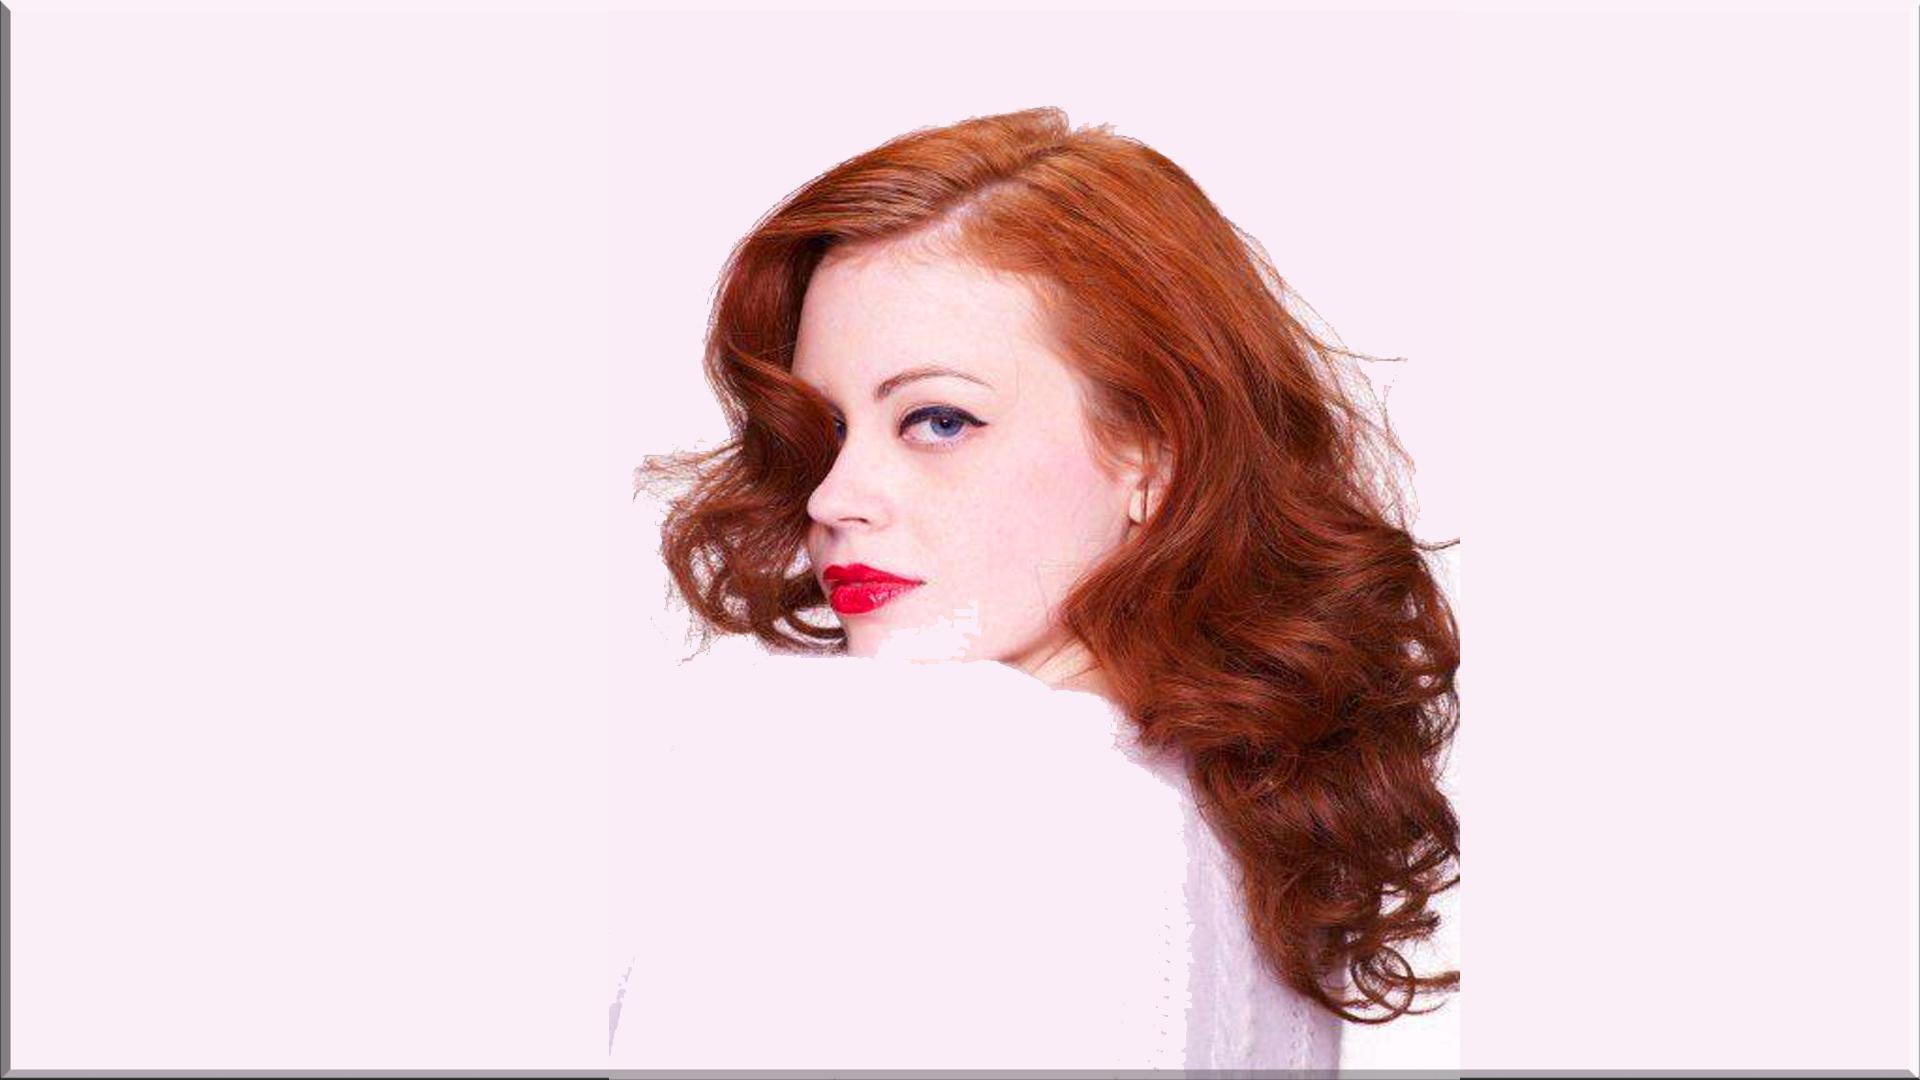 Women - Model Redhead Woman Wallpaper - Women HD PNG